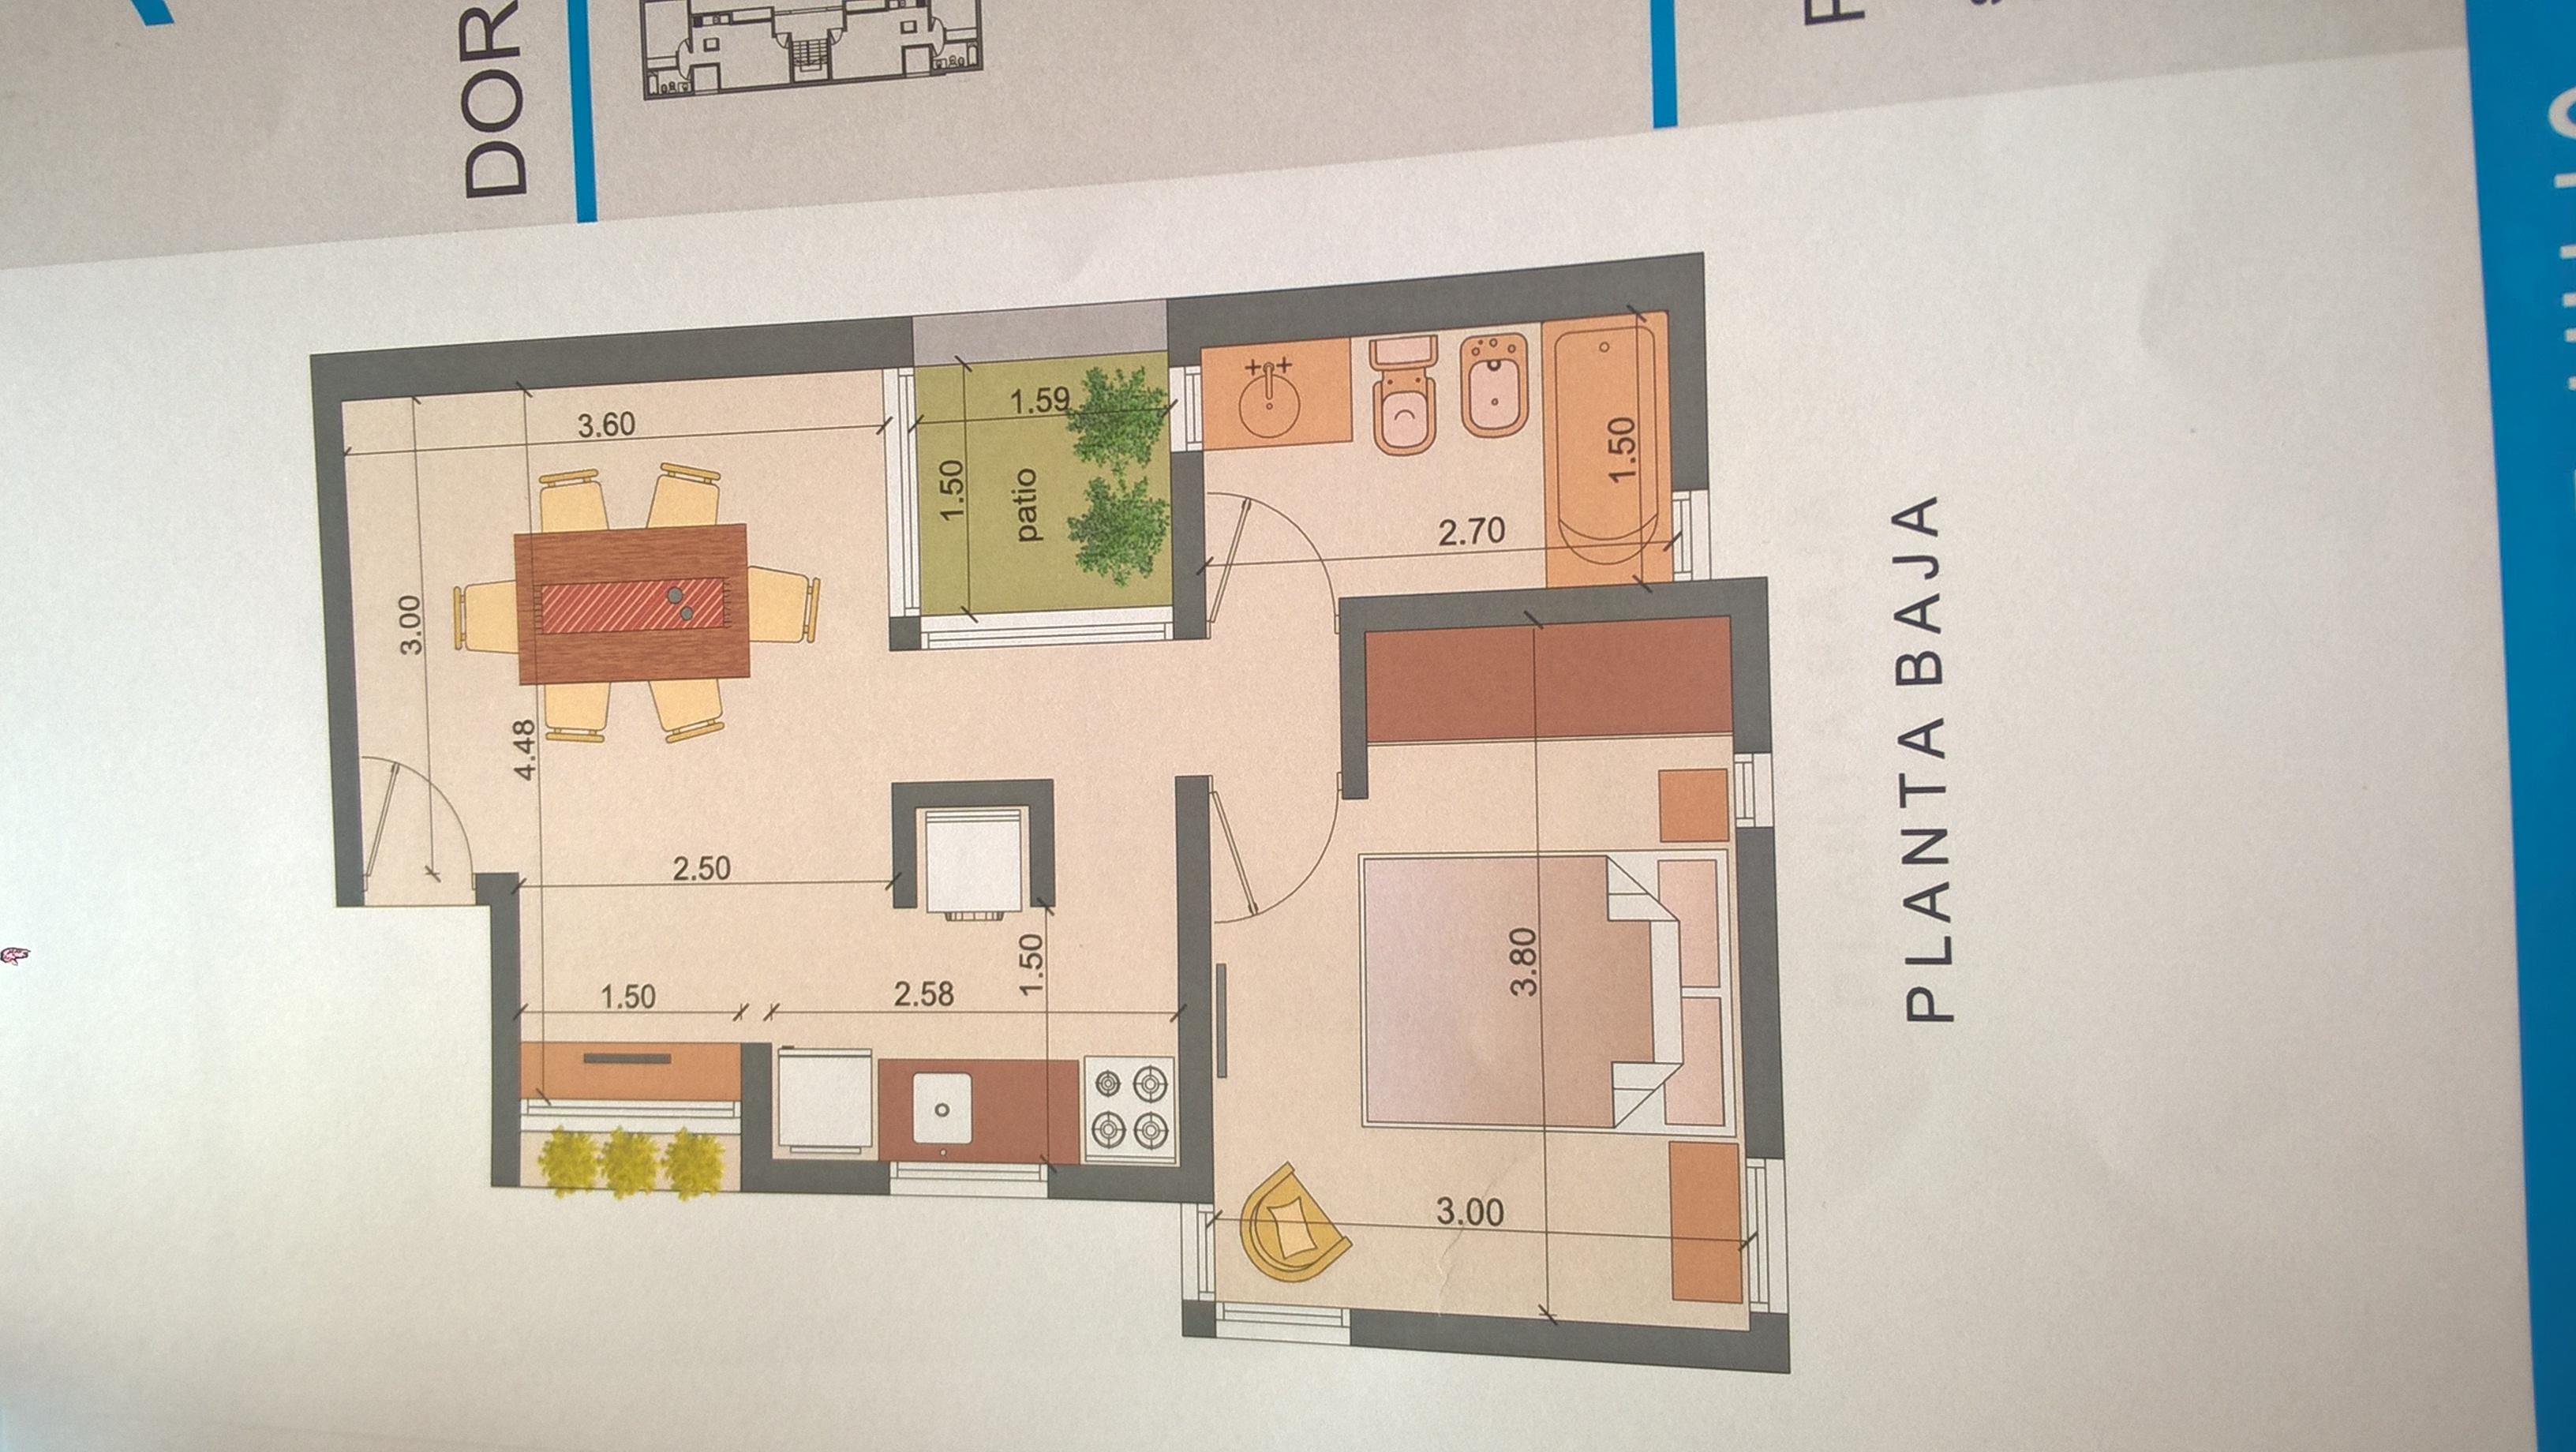 planta baja -1er o 2do piso